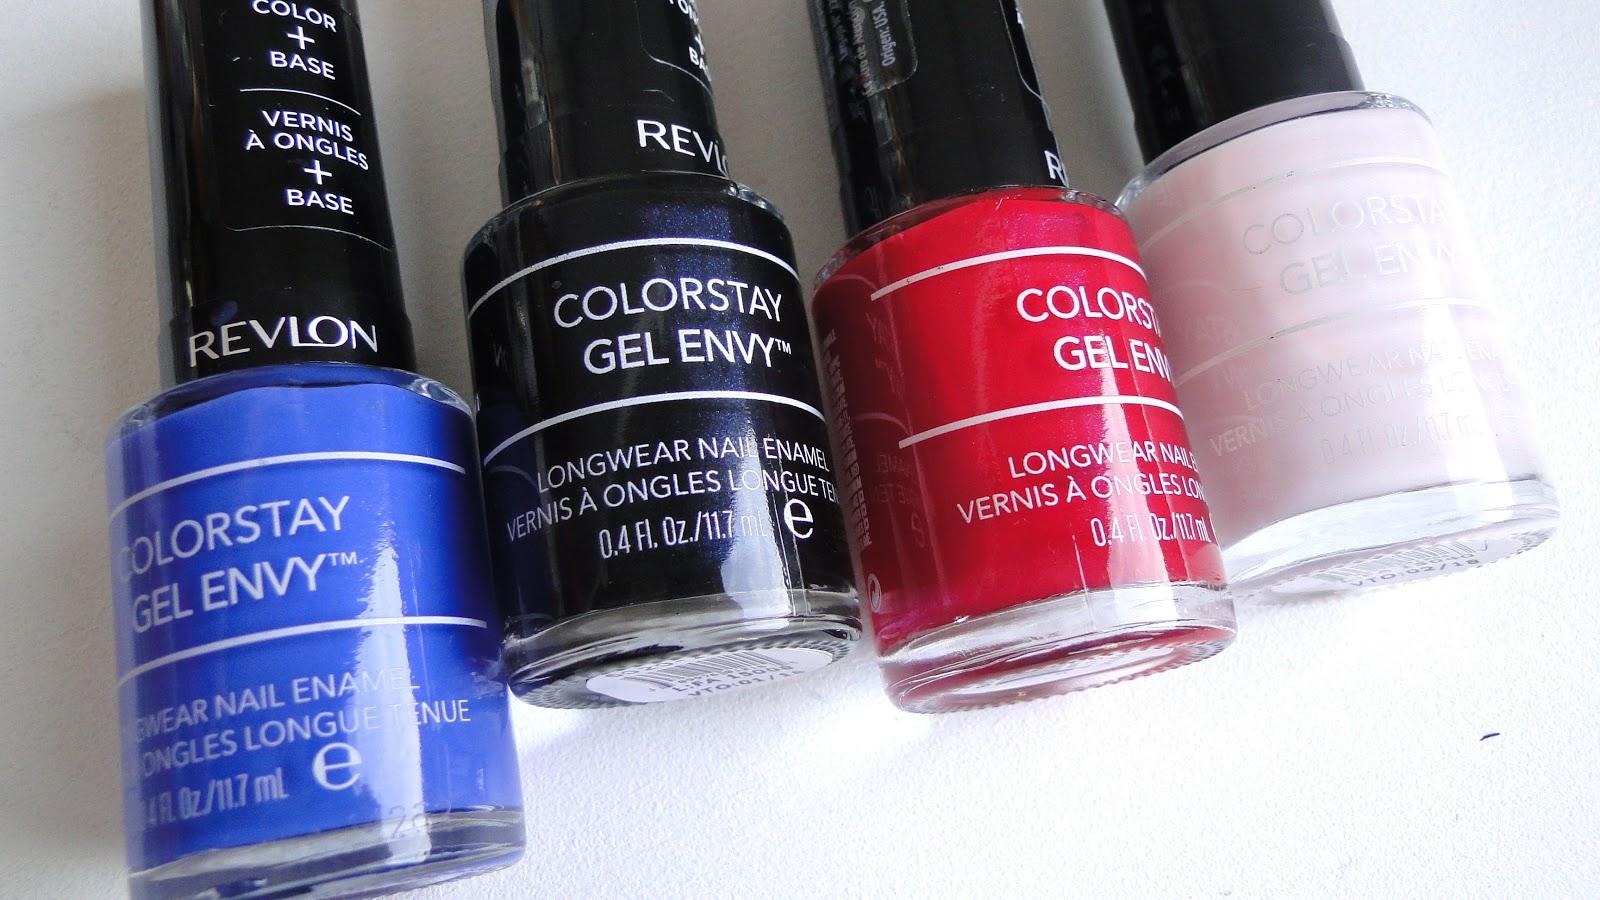 Colorstay Gel Envy de Revlon, color intacto. / Get Glam Or Die Trying